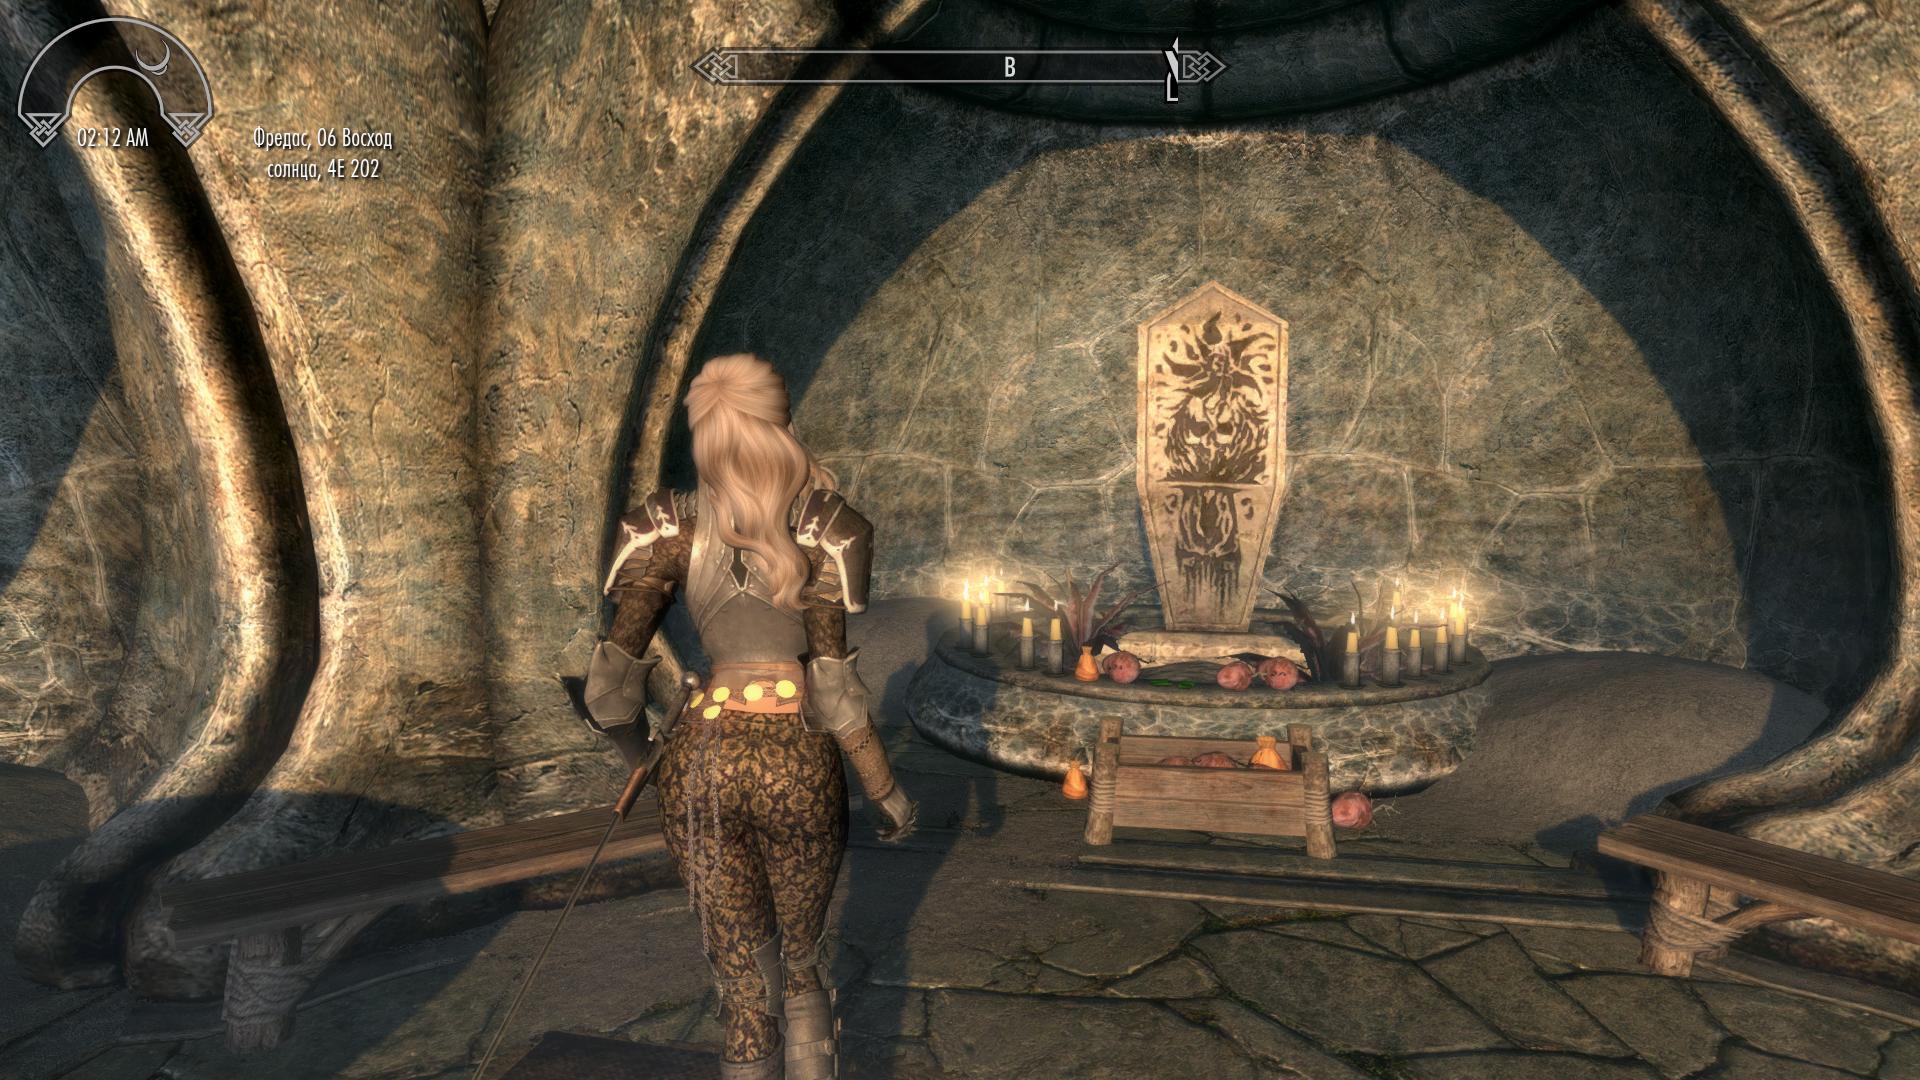 Elder Scrolls 5: Skyrim - Elder Scrolls 5: Skyrim, the